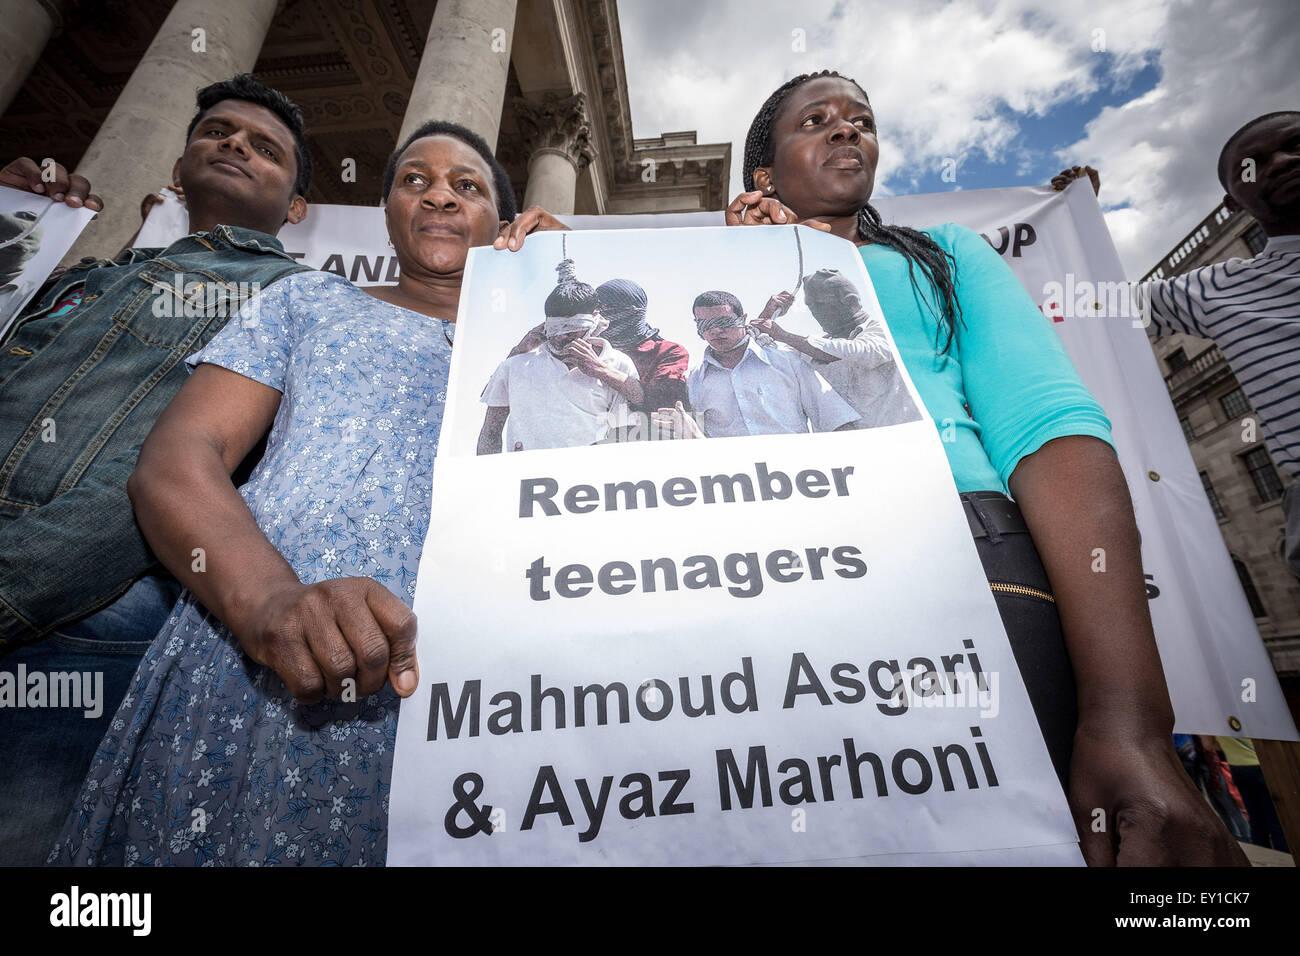 What necessary mahmoud asgari and ayaz marhoni hanged